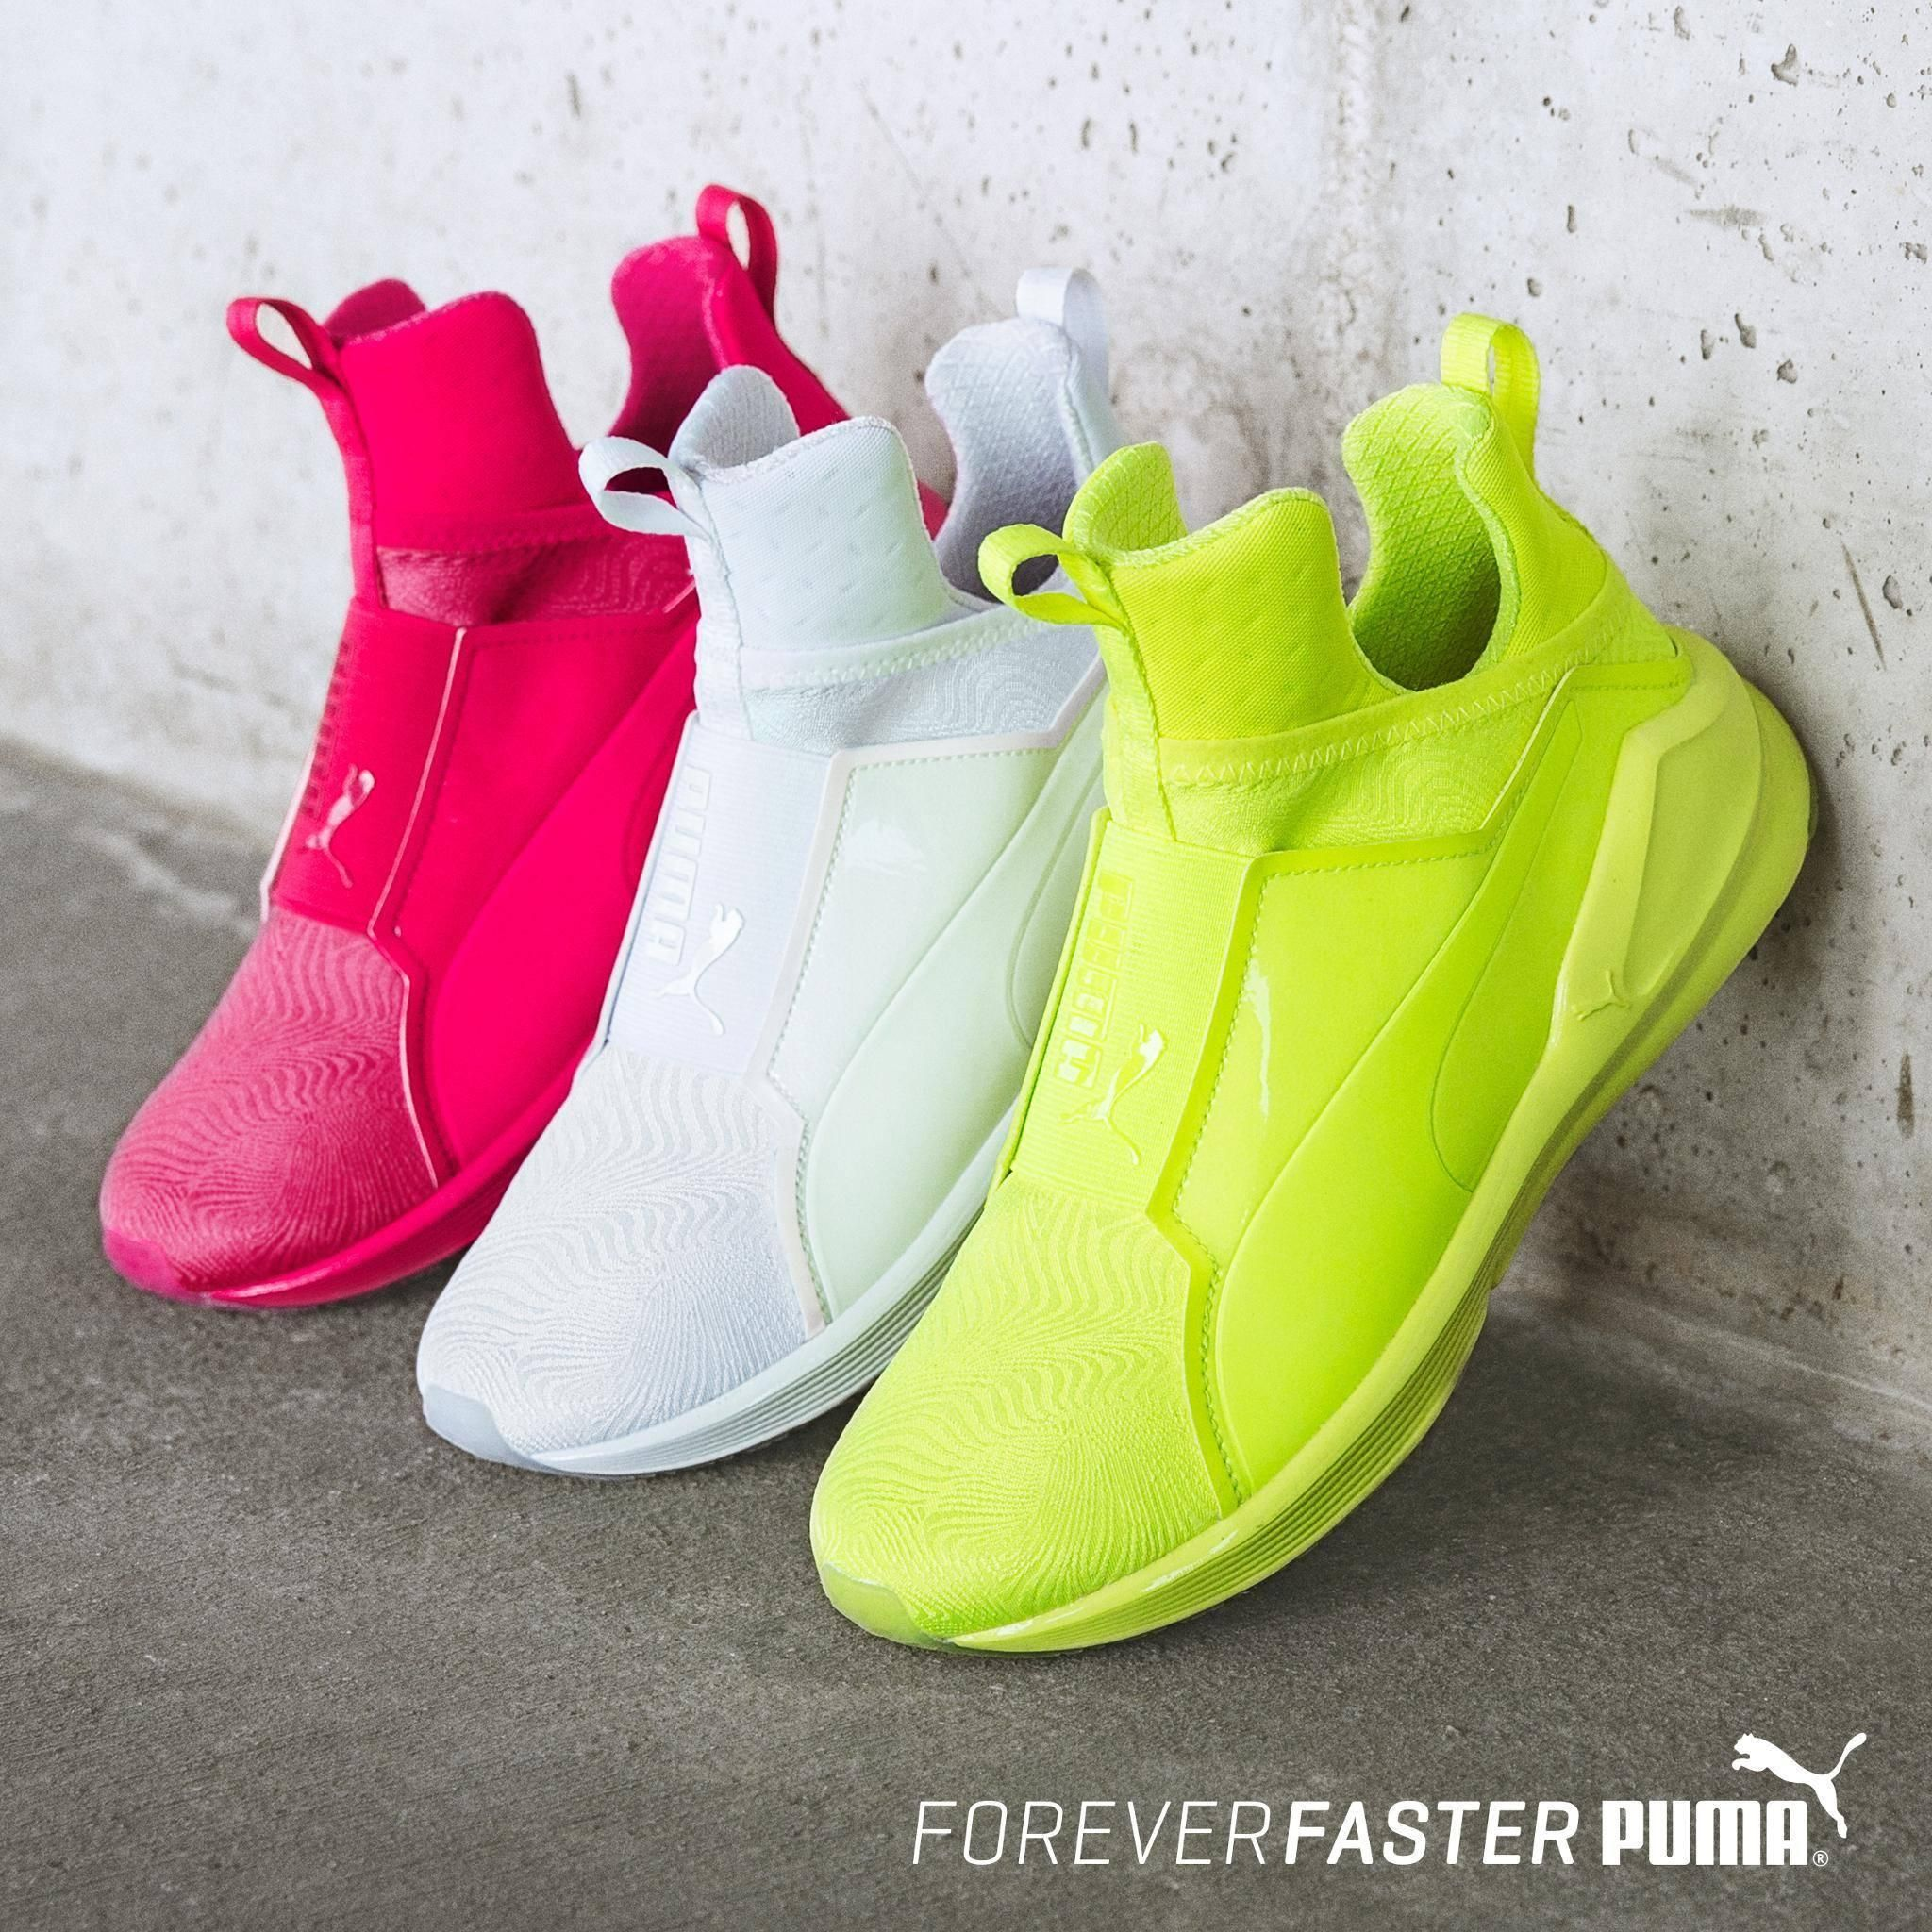 Bright BrightYouPuma Be Шкары Fierce Pinterest Shoes y8m0nvwON